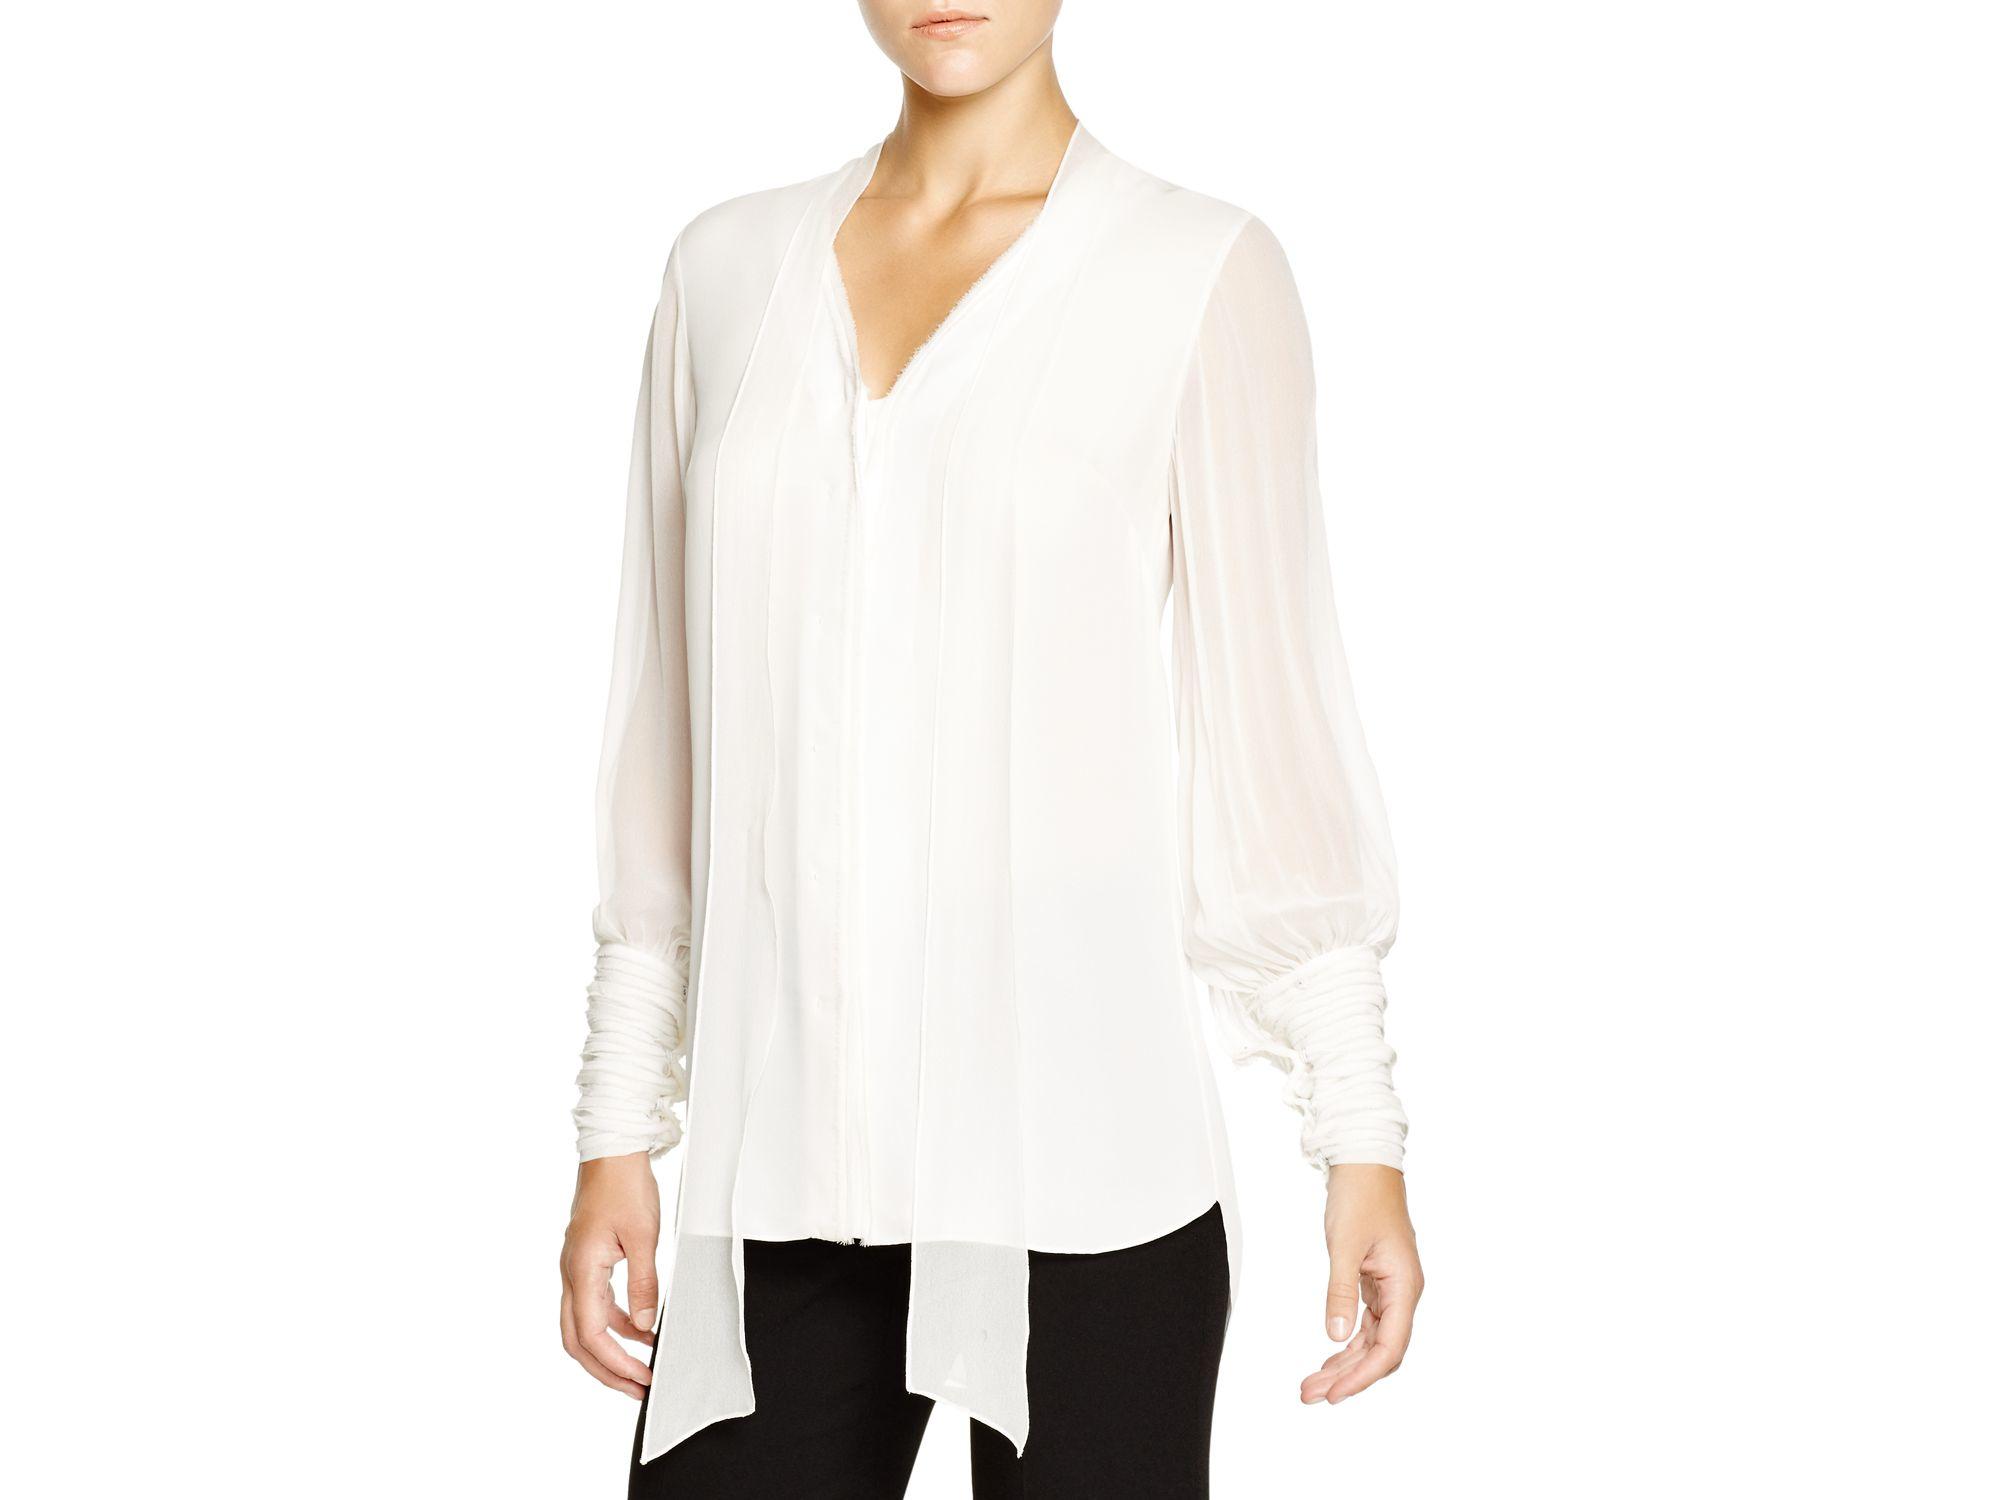 b58836c4f5a3f Lyst - Elie Tahari Shayna Silk Tie Neck Blouse in White